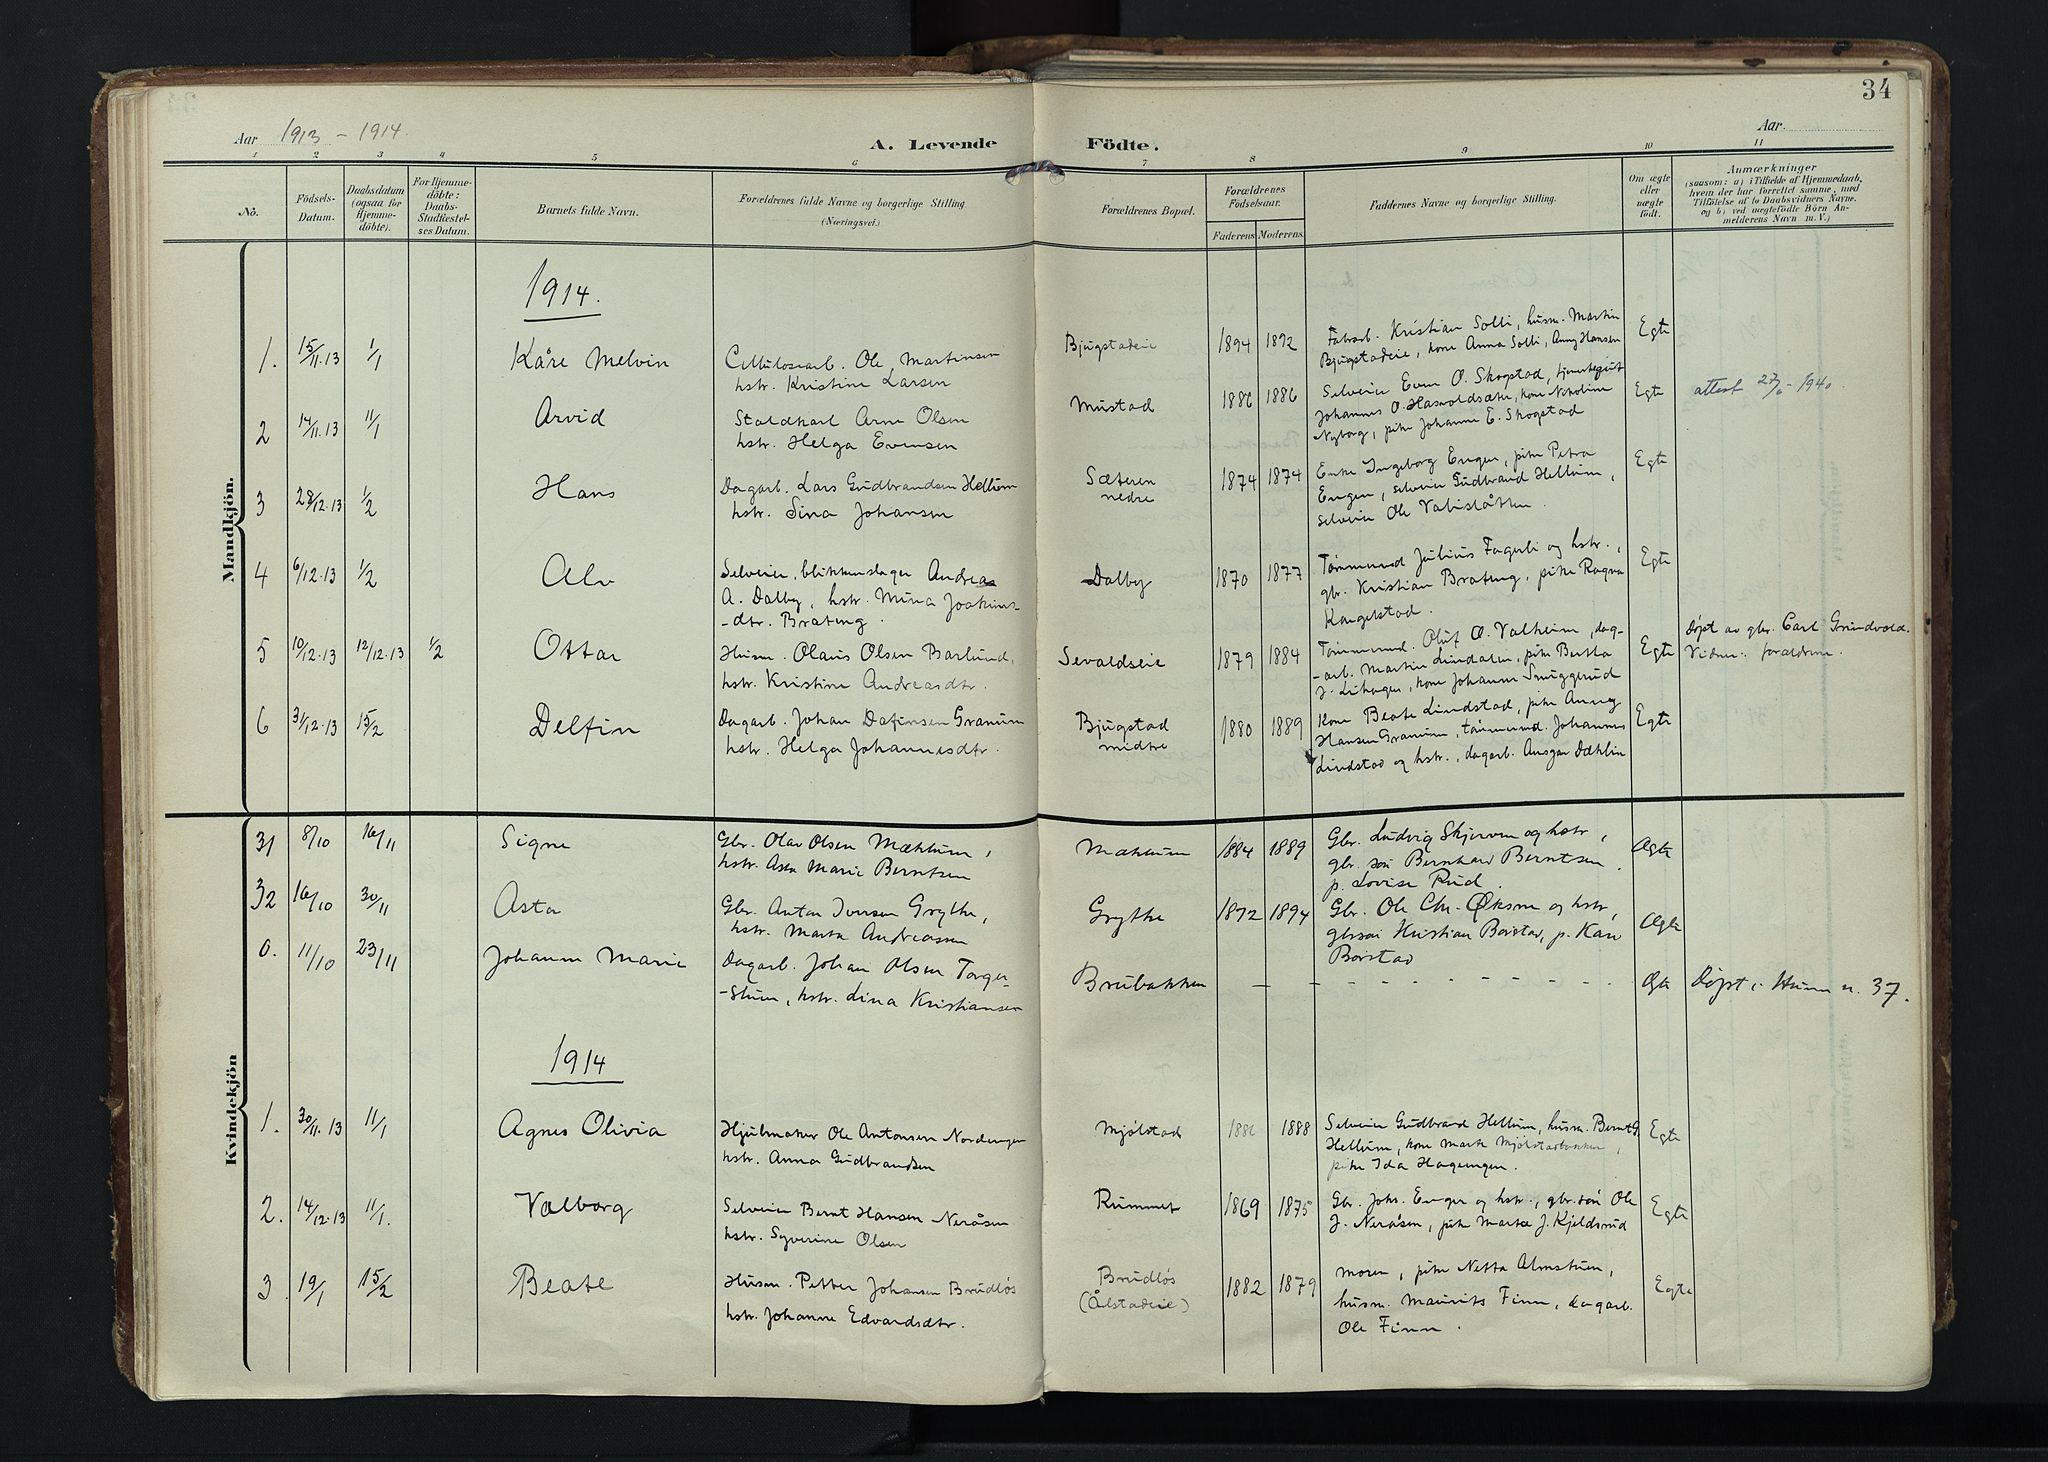 SAH, Vardal prestekontor, H/Ha/Haa/L0020: Ministerialbok nr. 20, 1907-1921, s. 34